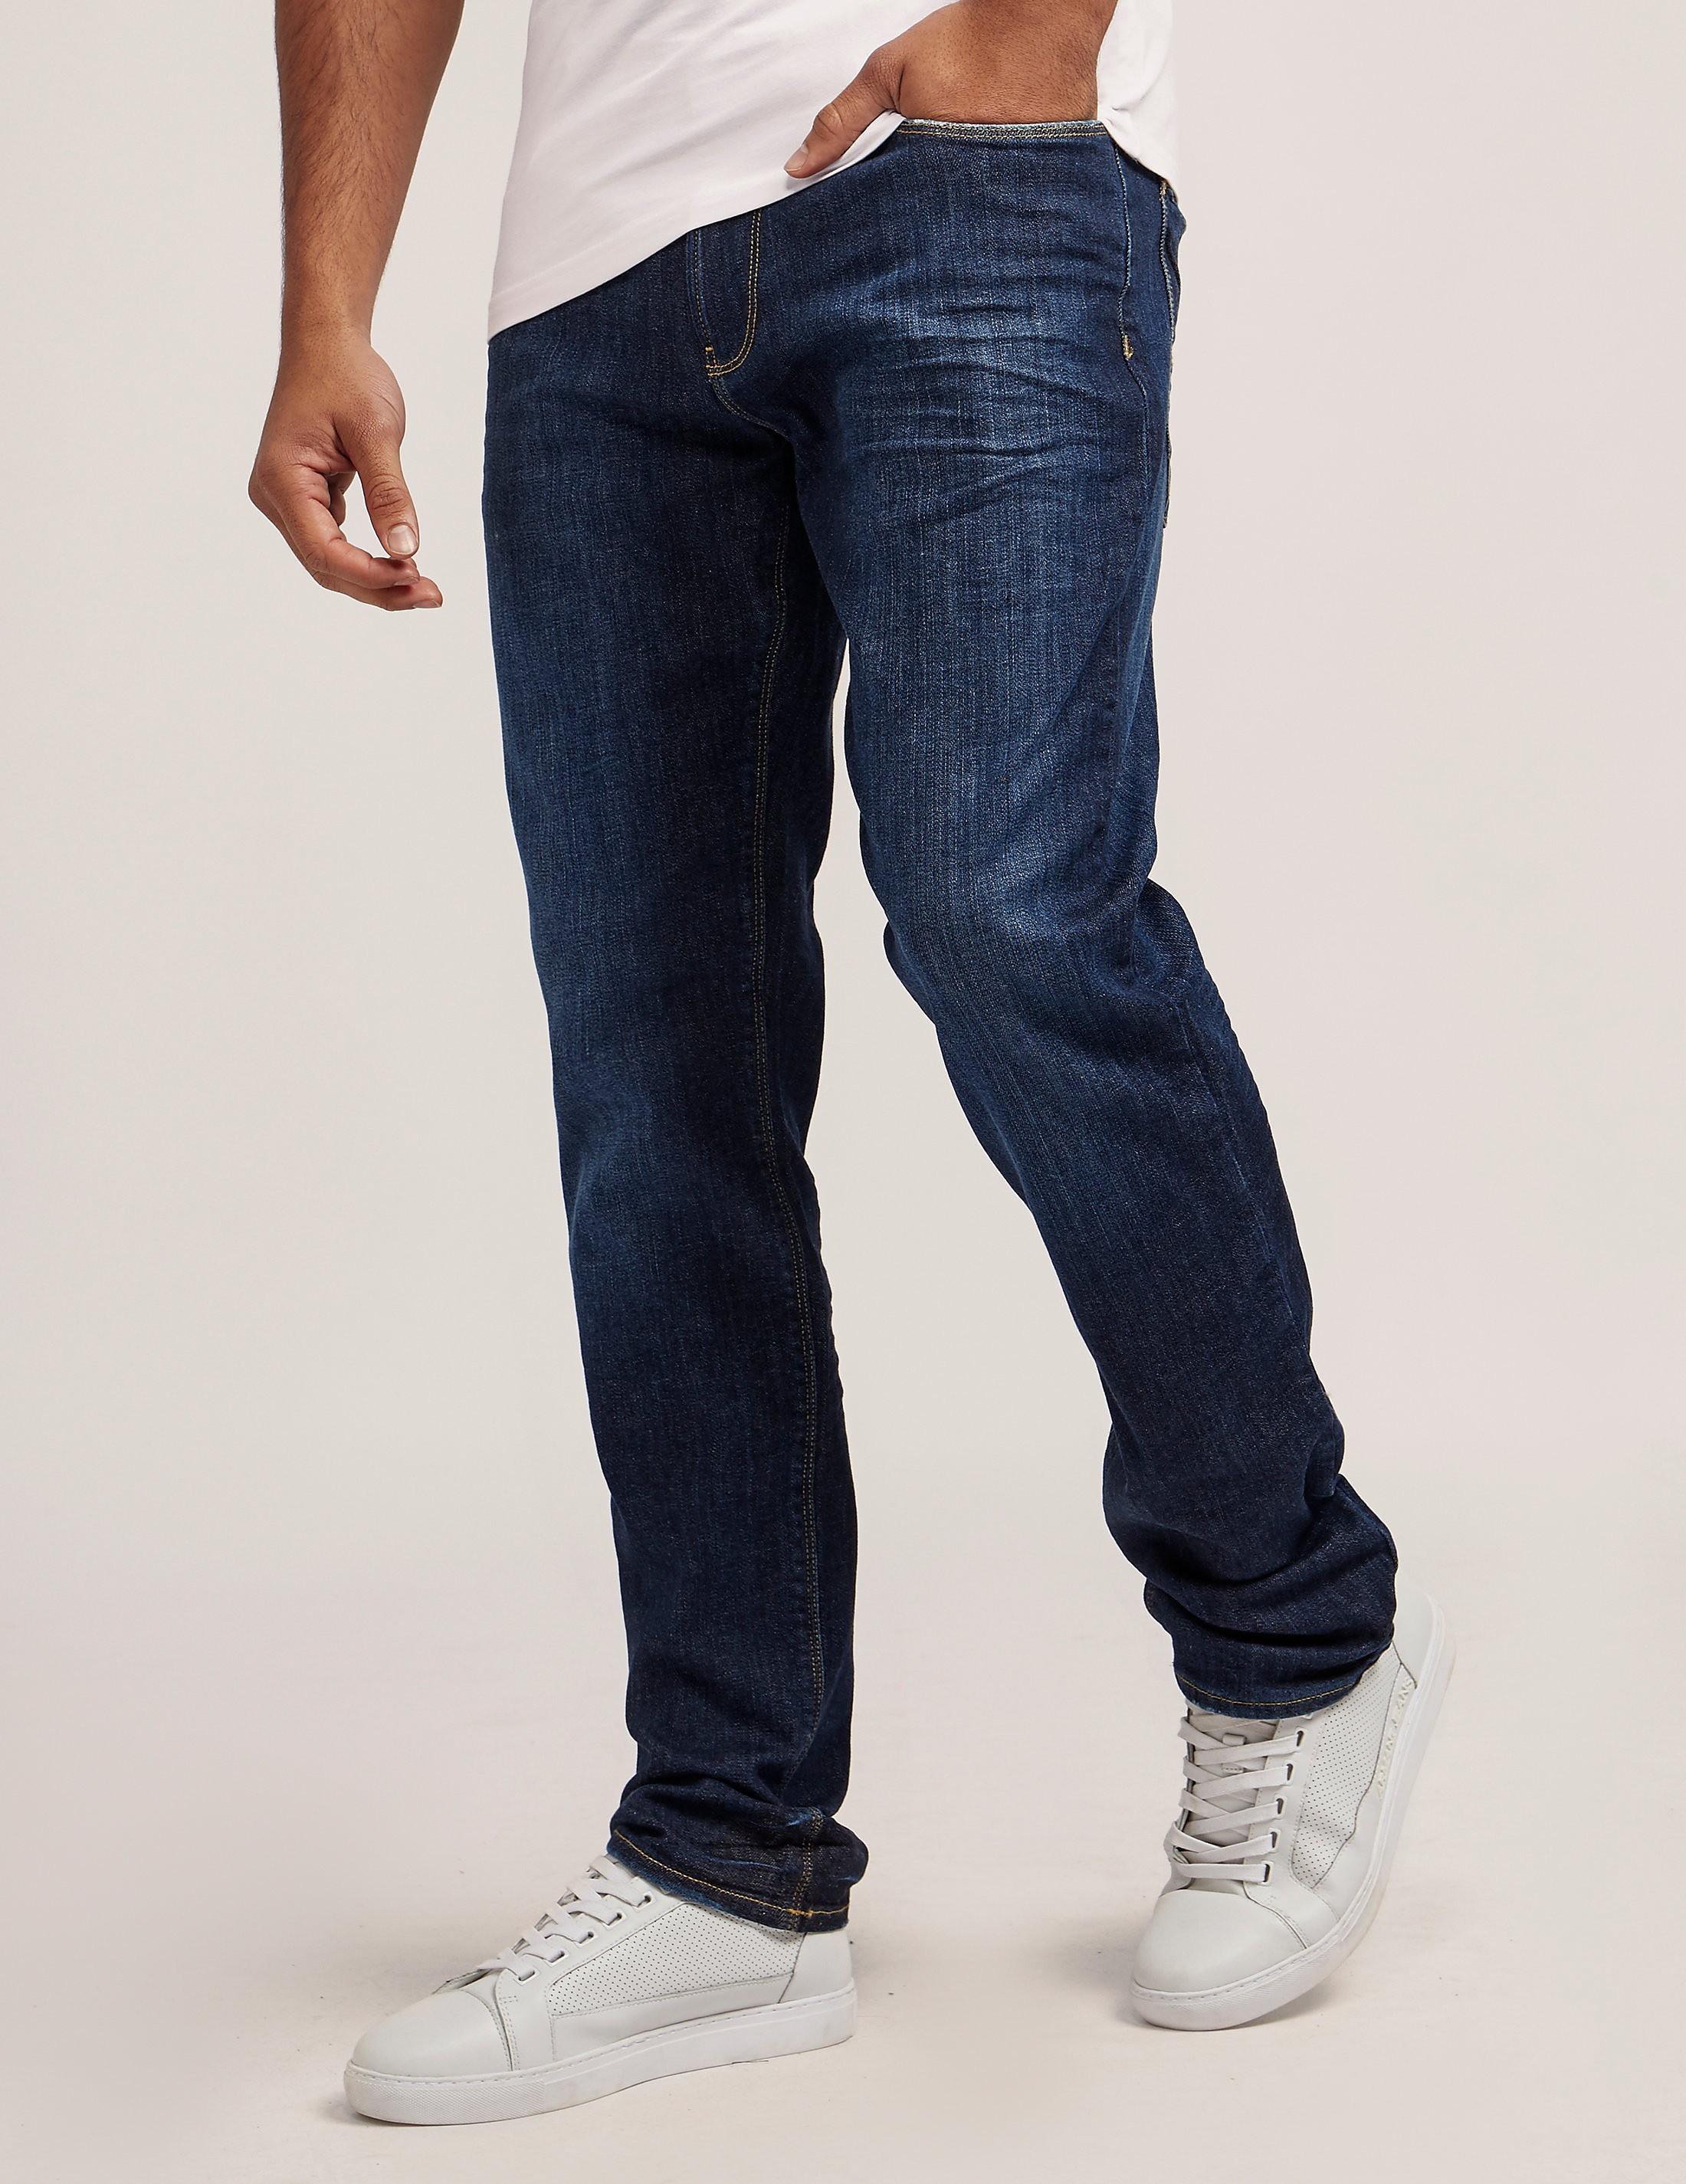 Armani Jeans J06 Regular Jeans